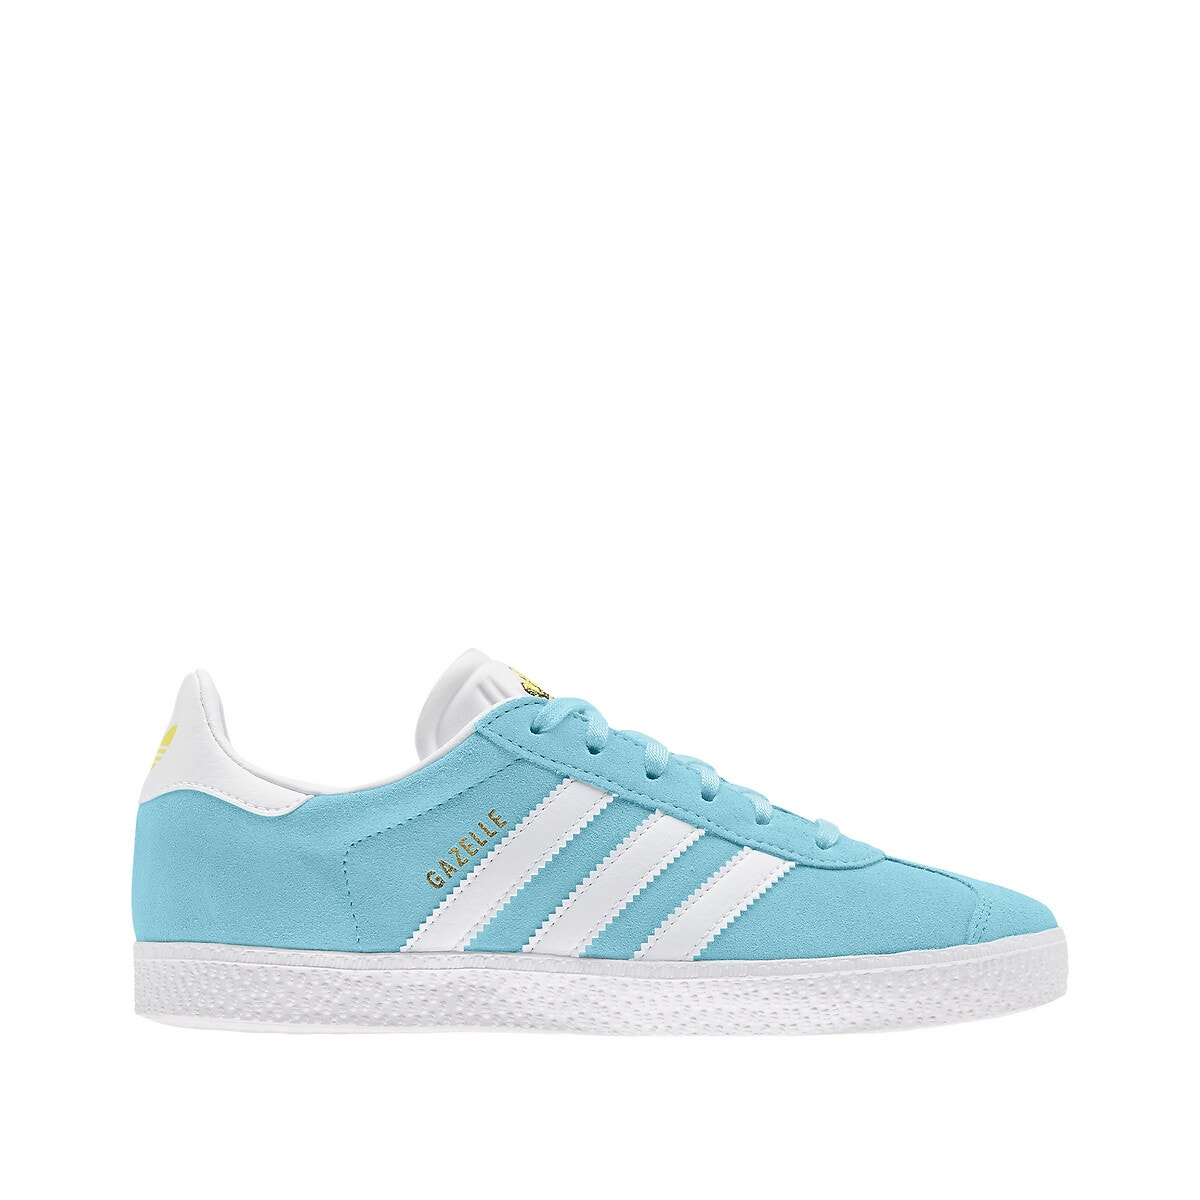 Adidas gazelle bleu turquoise | La Redoute